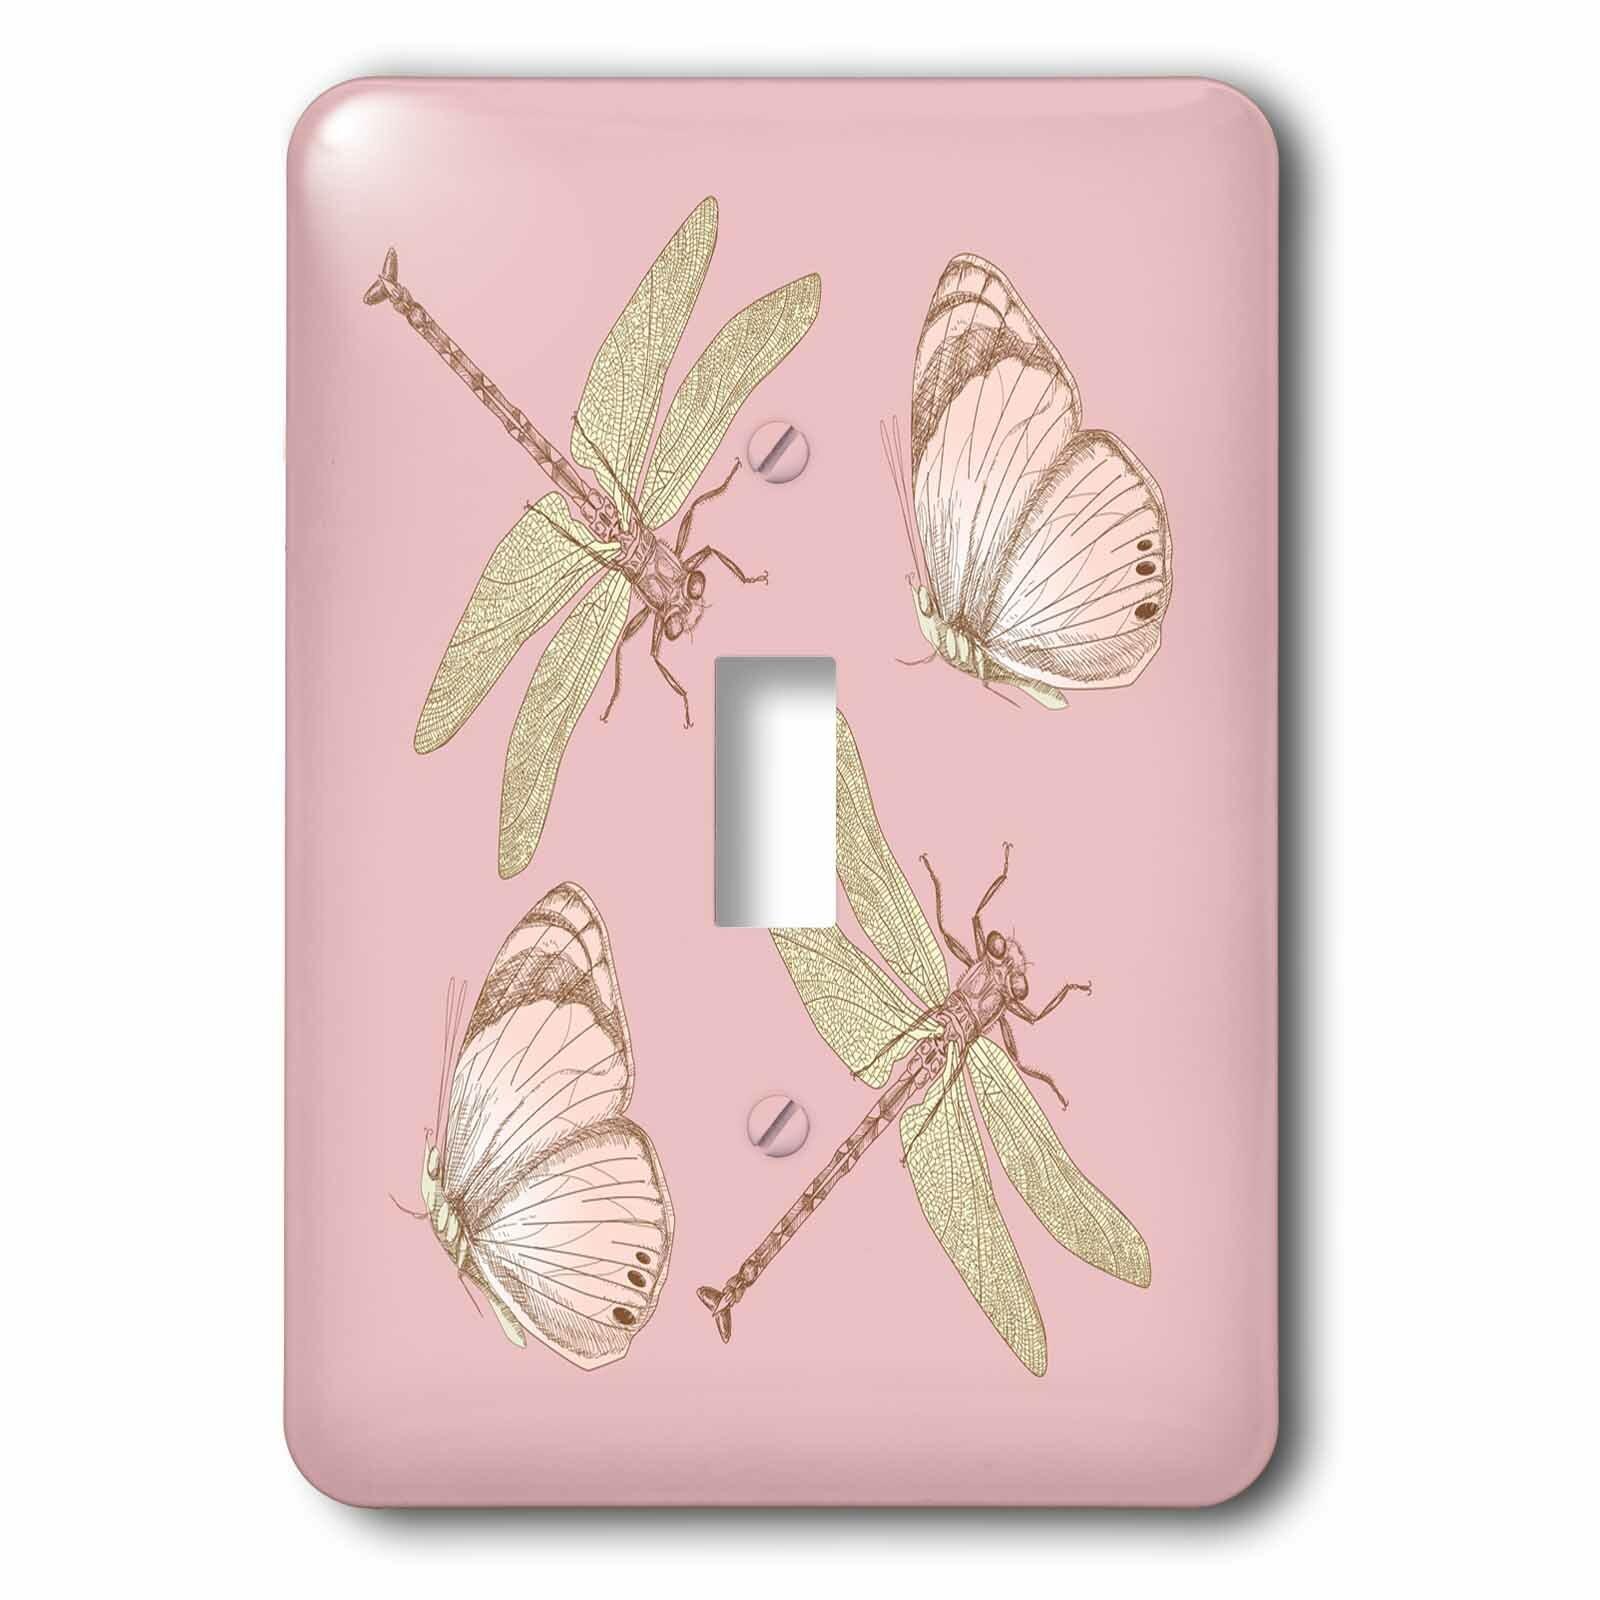 3drose Dragonflies And Butterflies 1 Gang Toggle Light Switch Wall Plate Wayfair